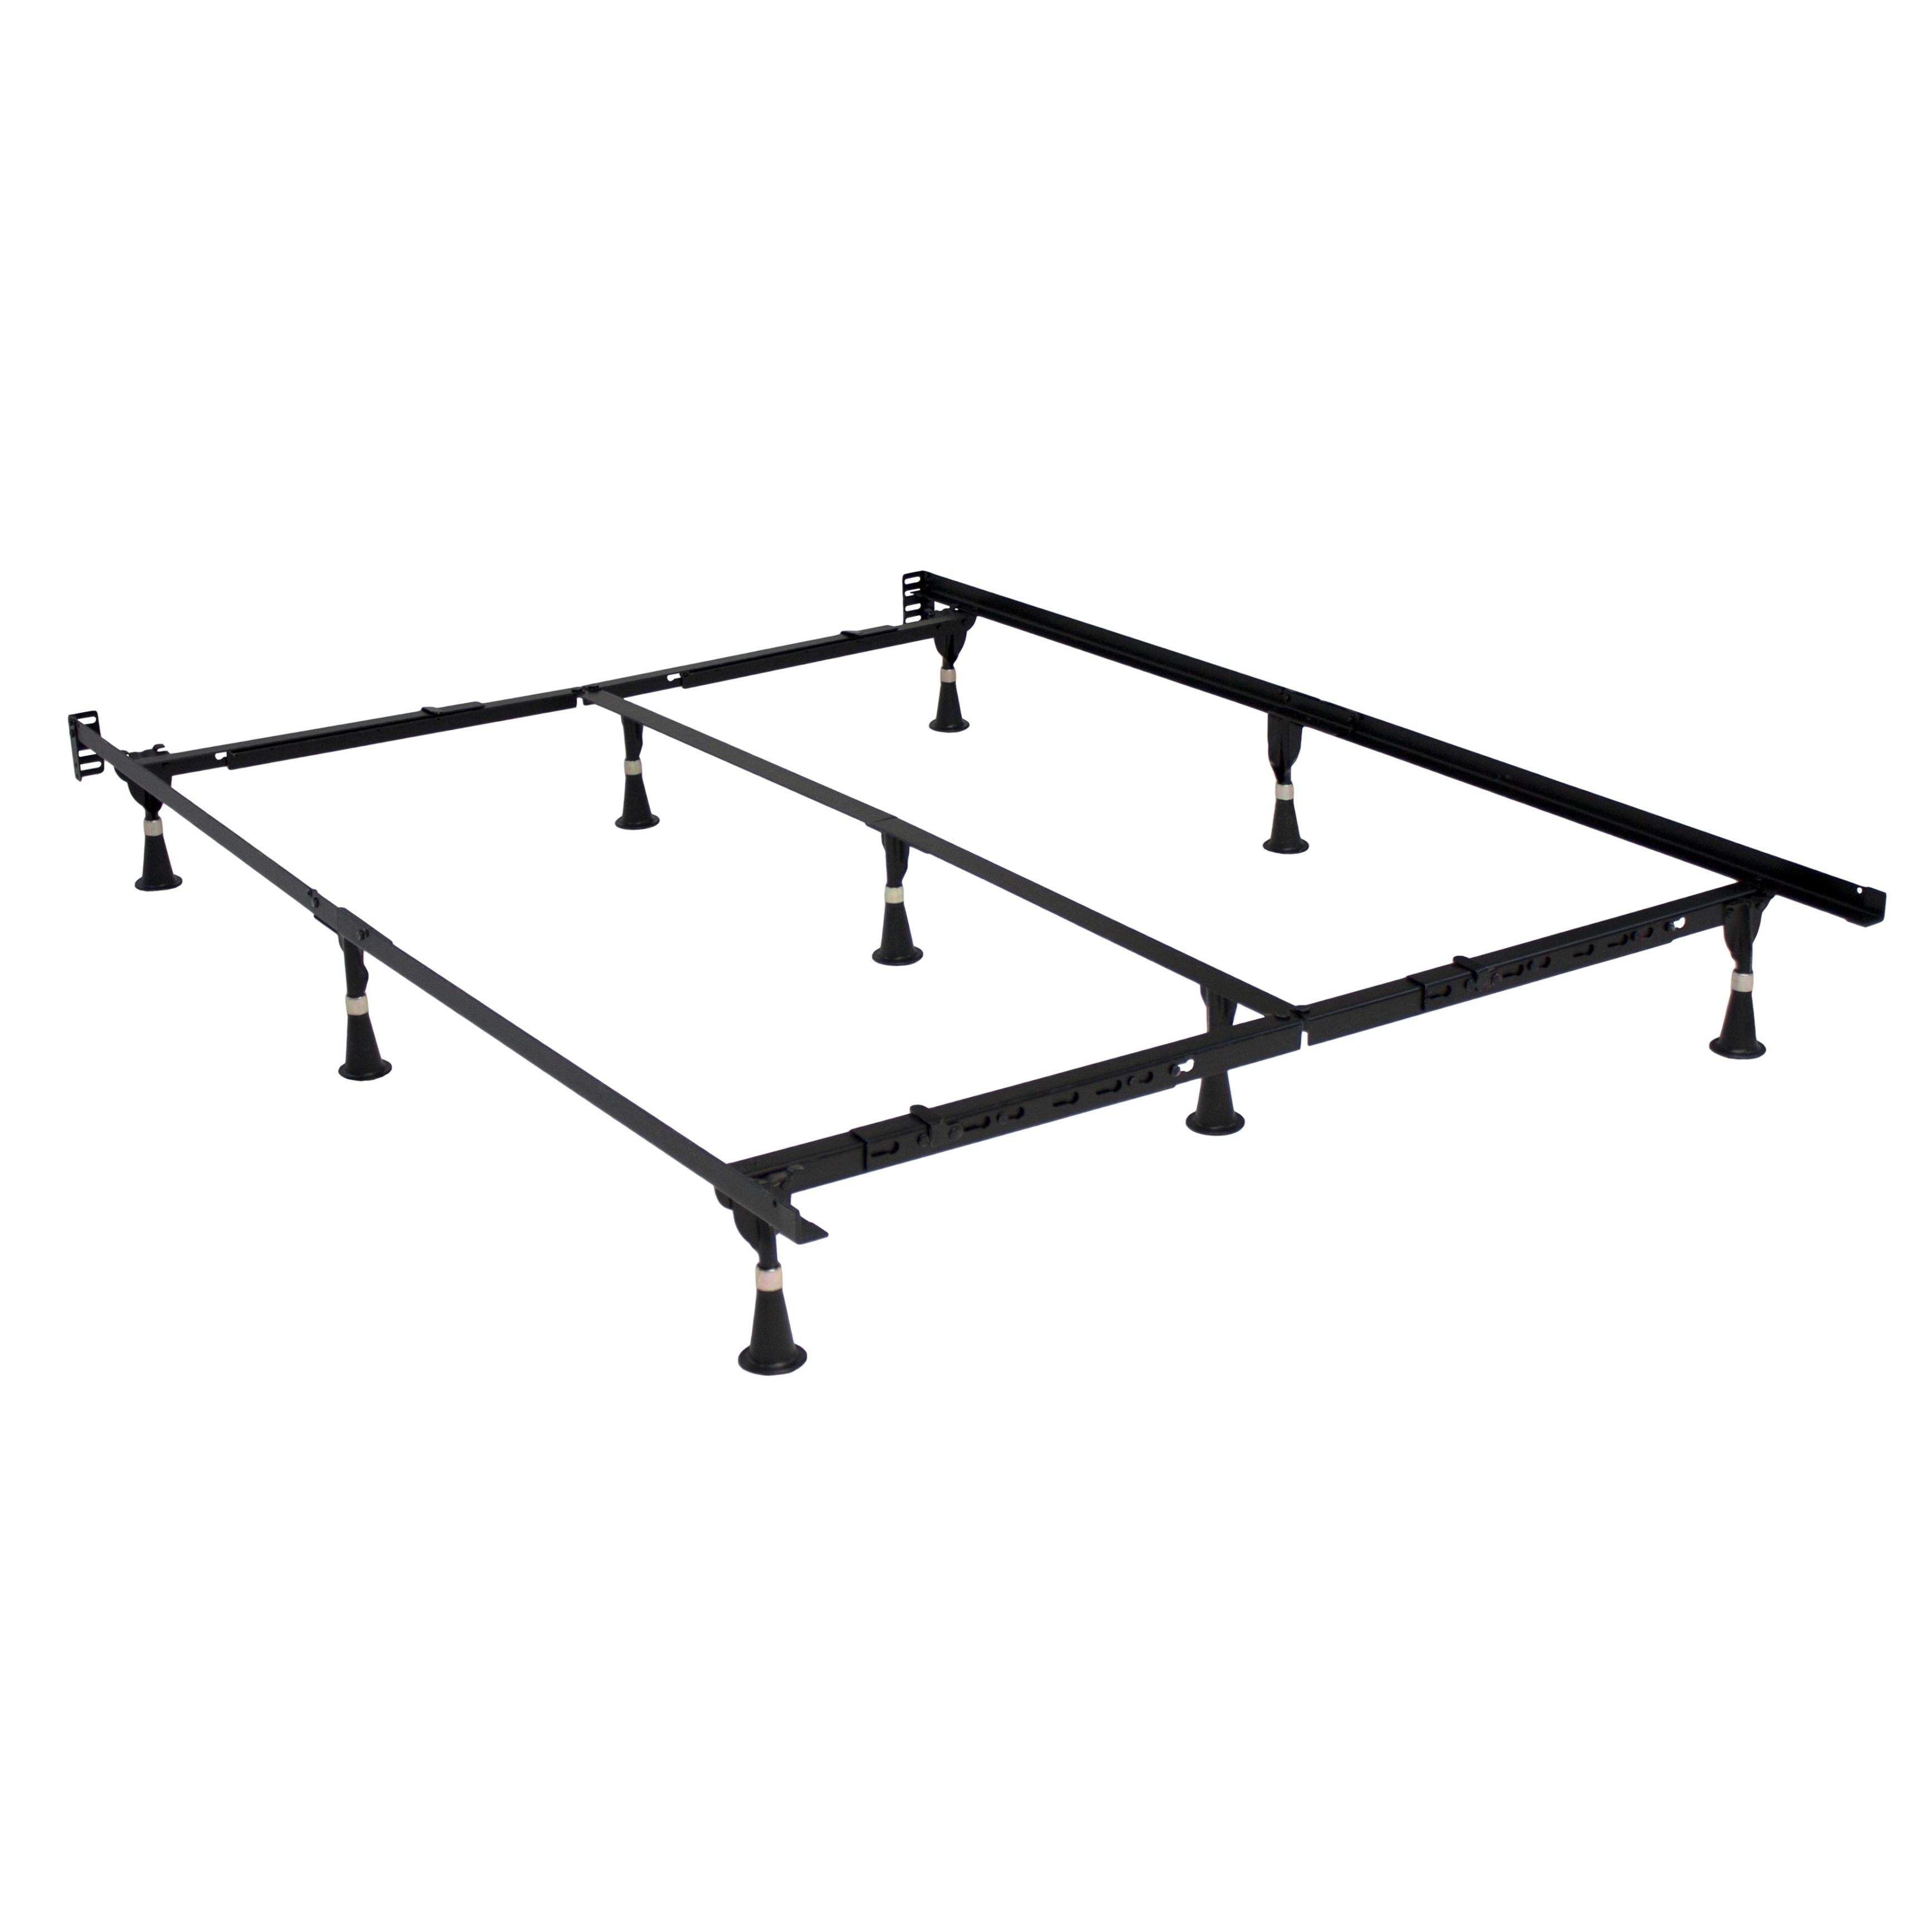 Serta Stable-base Premium Elite 'C' Bed Frame, Brown, Siz...